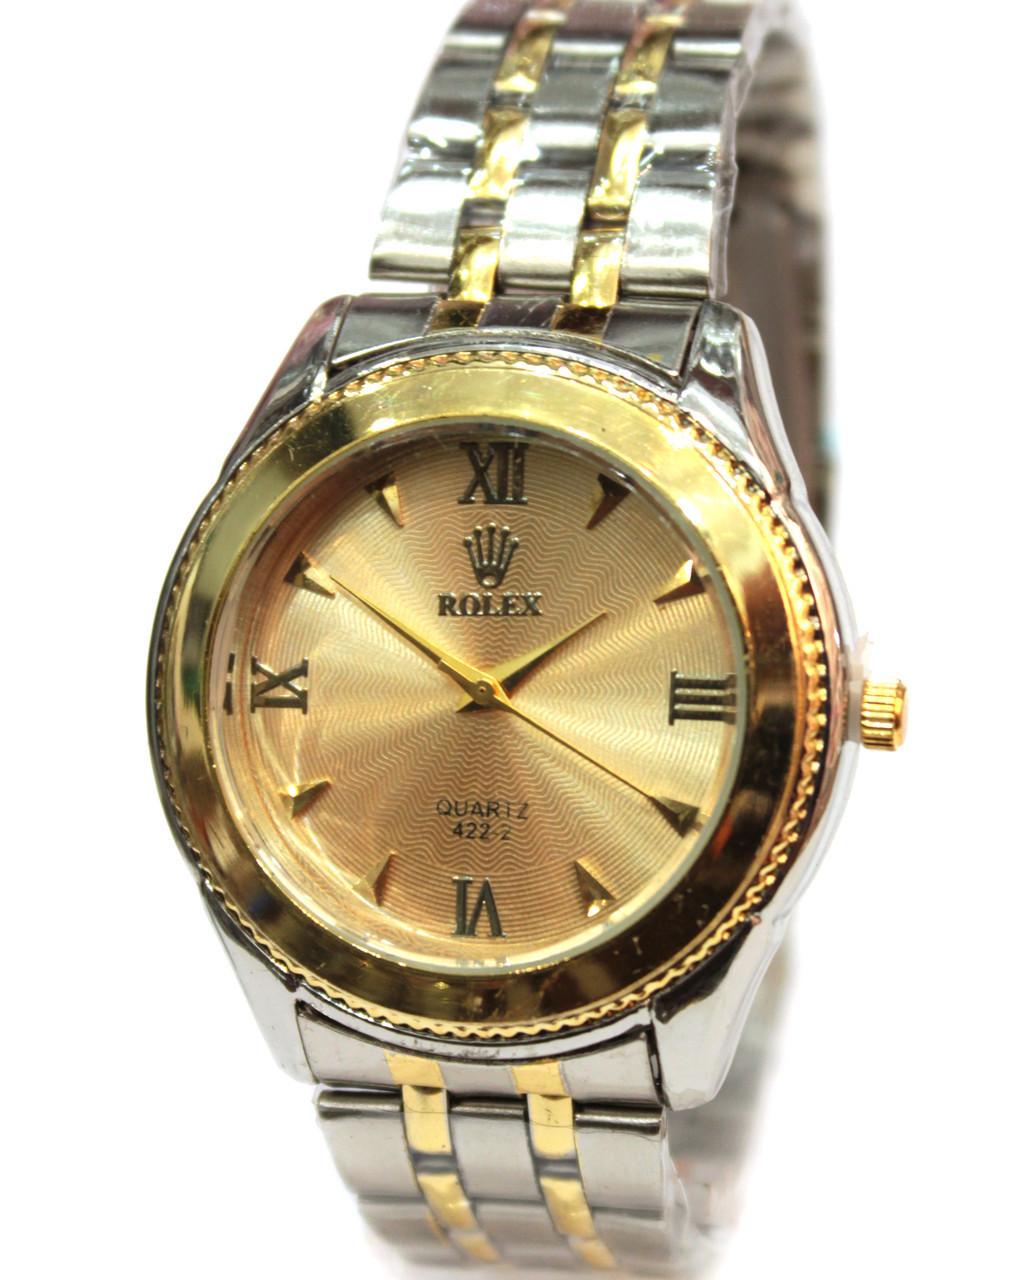 20a0788d19c3 Мужские часы Ролекс, цена 638 грн., купить в Харькове — Prom.ua (ID ...